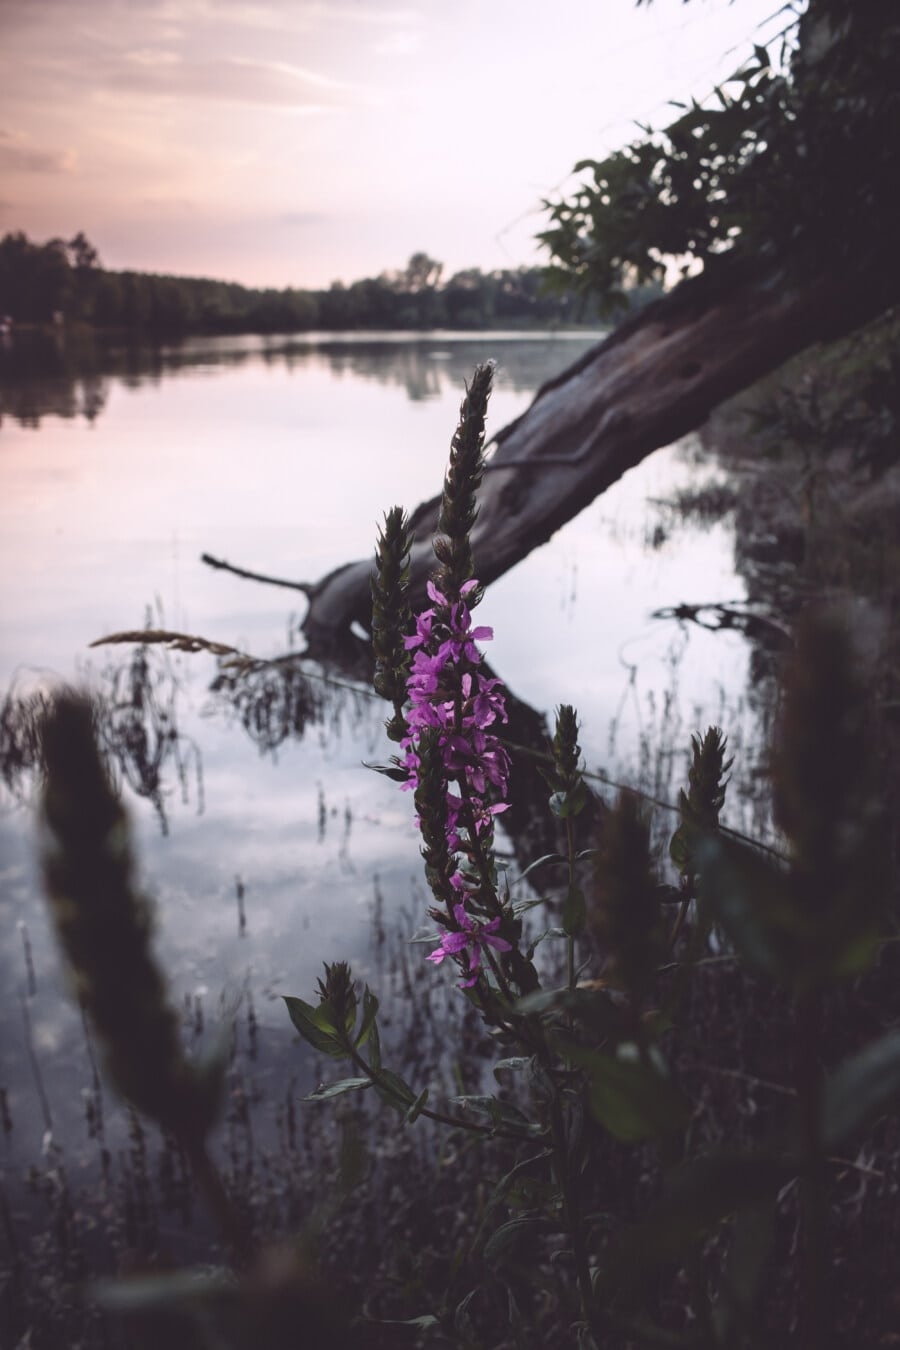 Wildblumen, violett, Sumpf, Struktur, Wald, Landschaft, Park, Fluss, Bäume, im freien